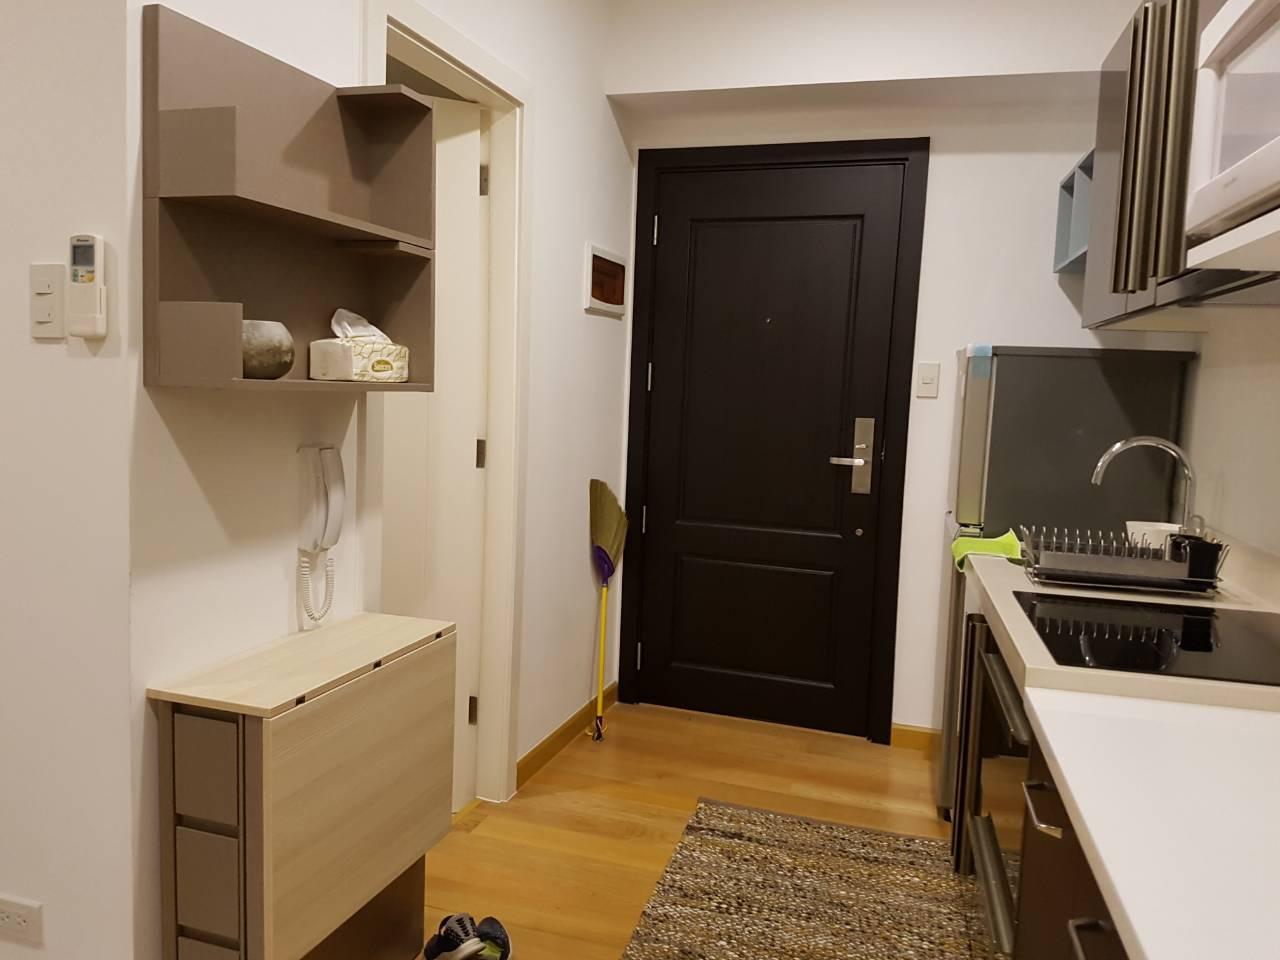 Studio Condo For Rent Milano Residences Entrance